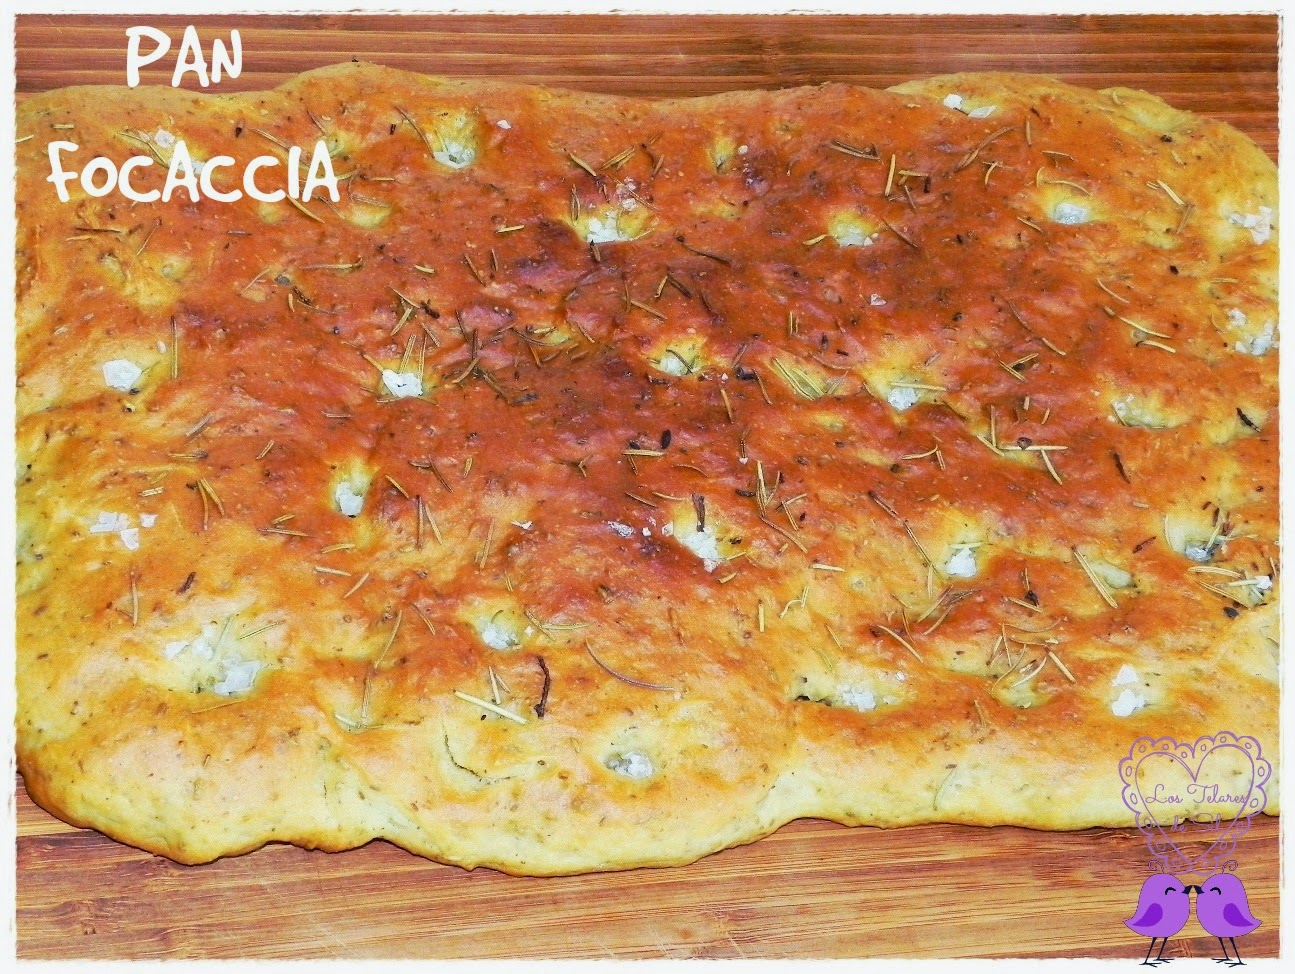 PAN FOCACCIA CASERO